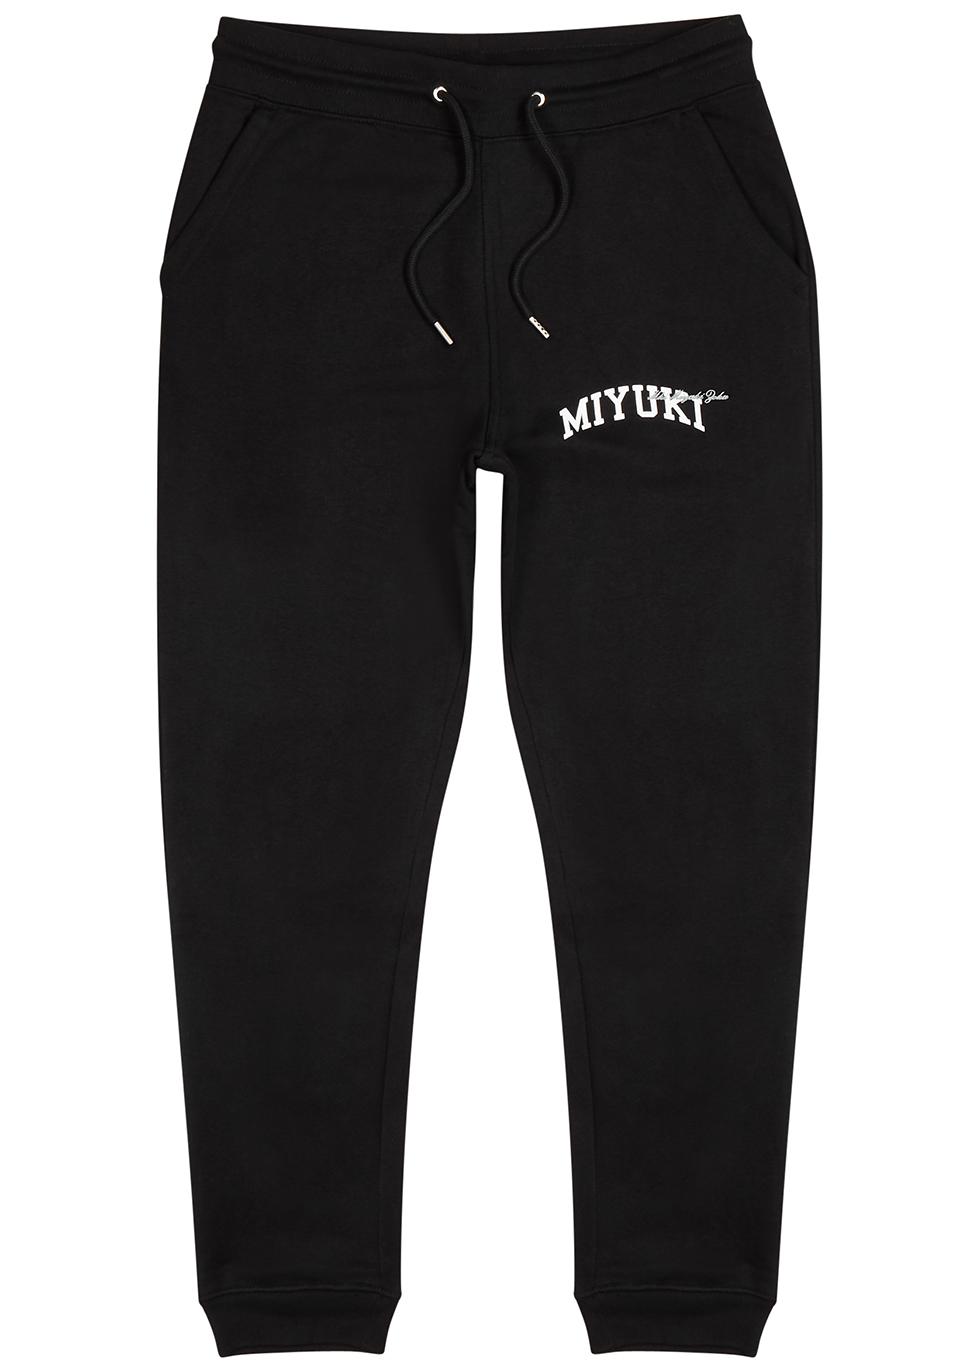 Black logo jersey sweatpants